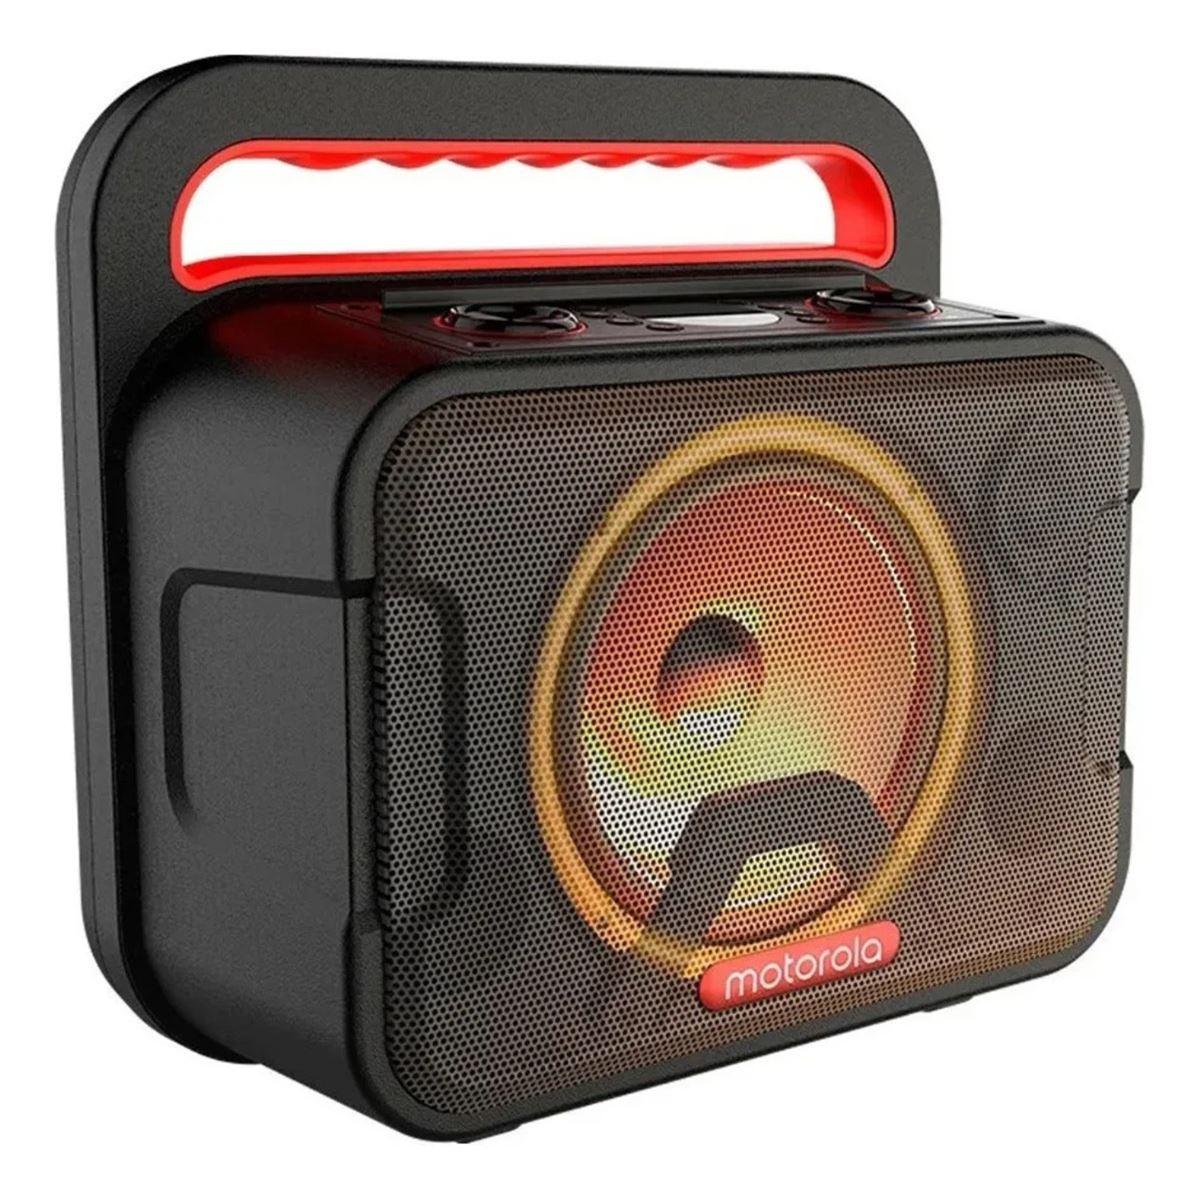 Bocina Portátil Motorola Sonic Maxx 810